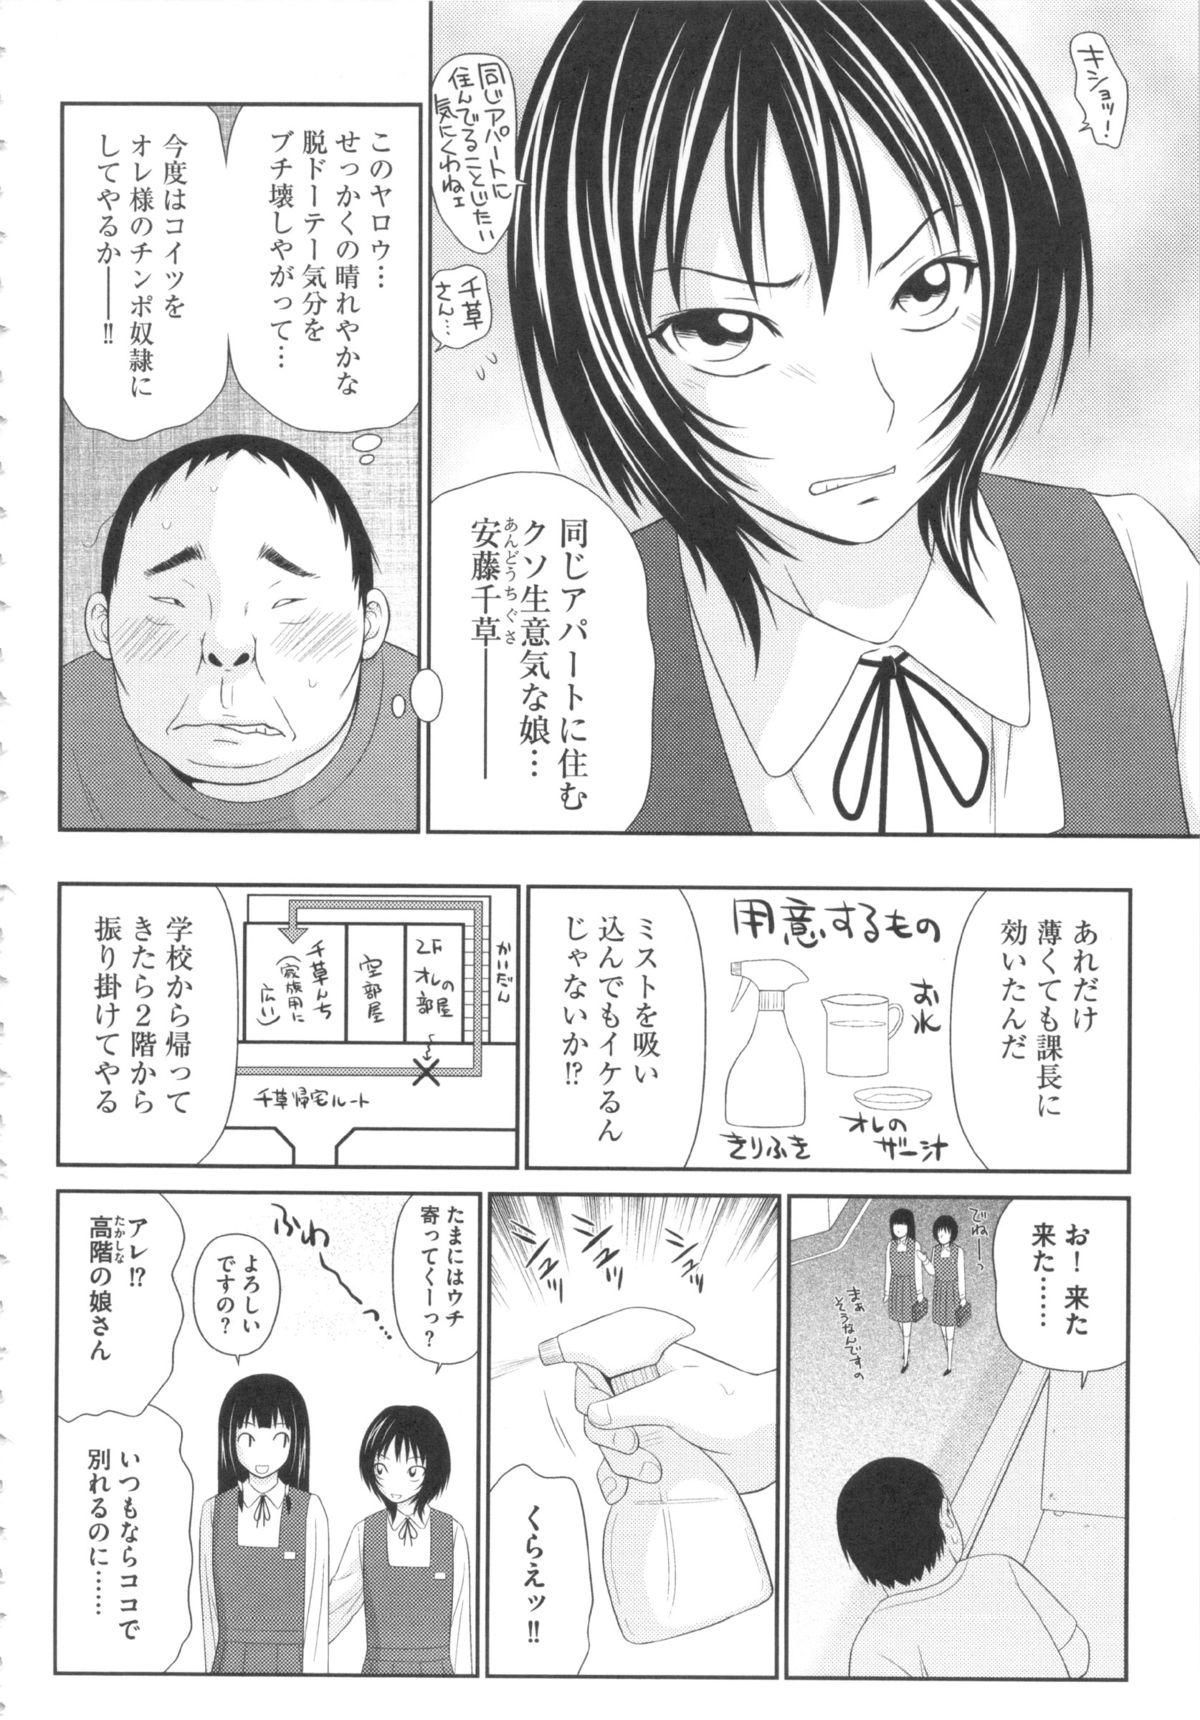 Kiseki No Zaajiru - Sperm of Miracle 26